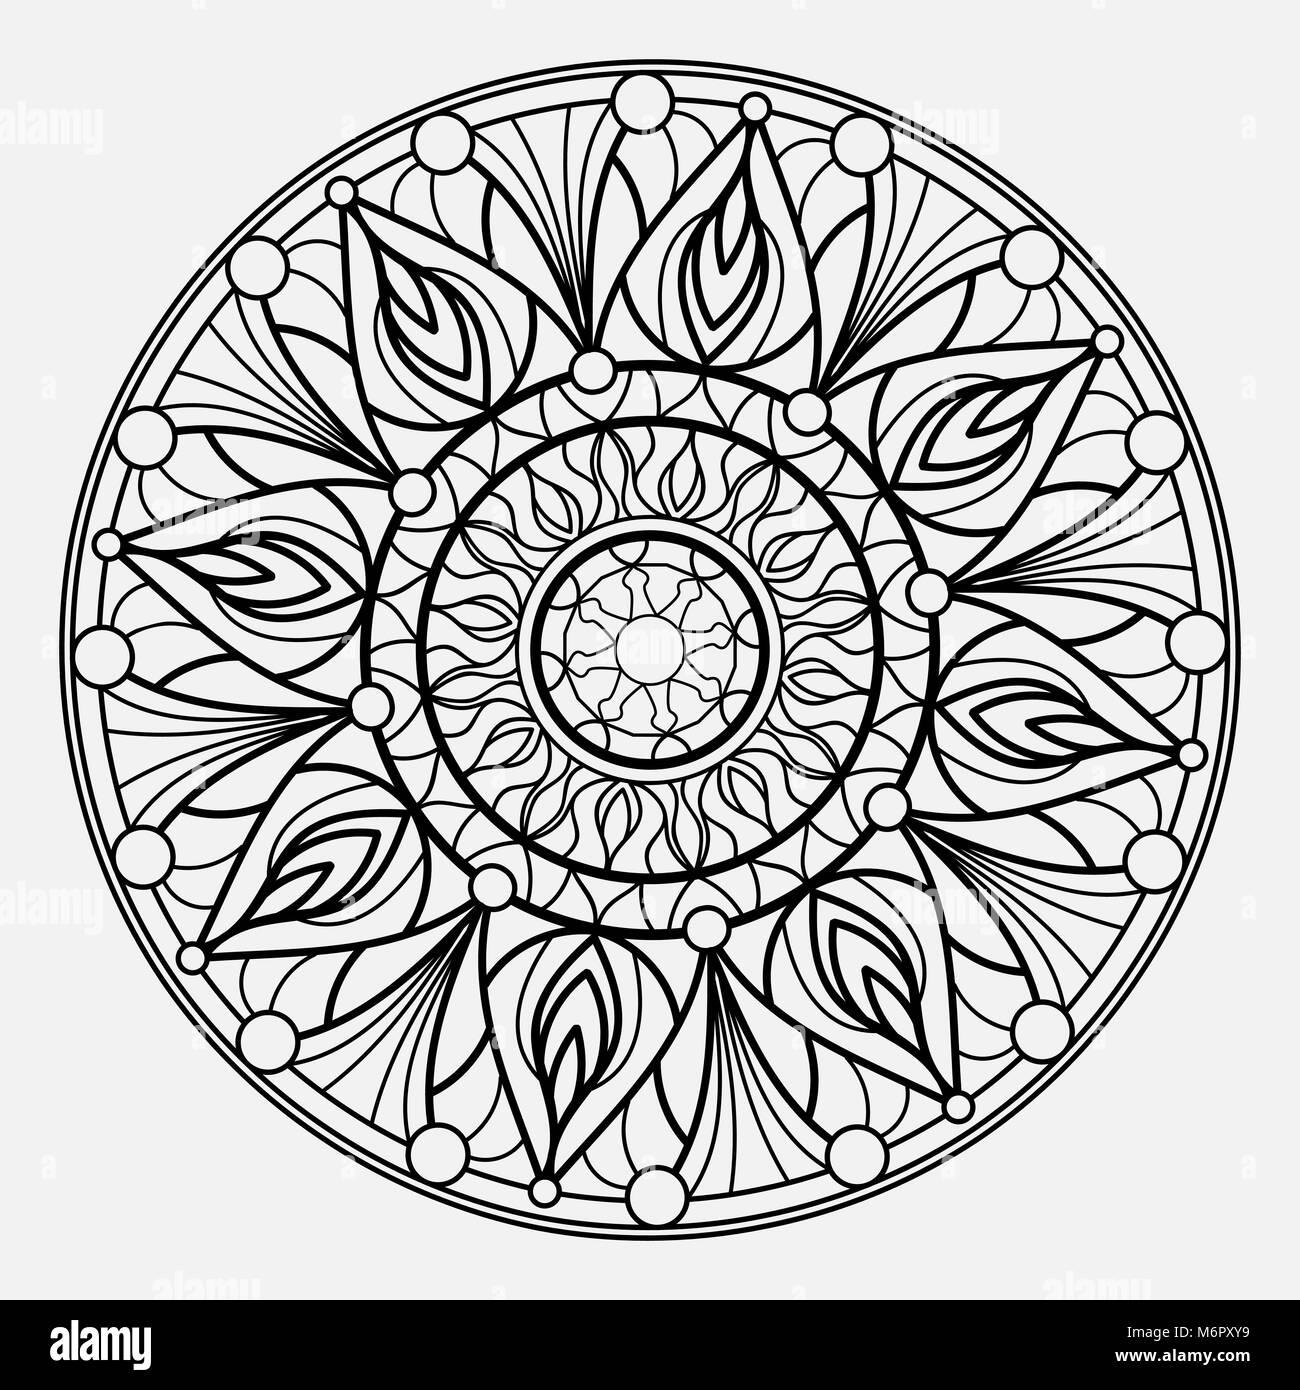 Weave Mandala Imágenes De Stock & Weave Mandala Fotos De Stock - Alamy